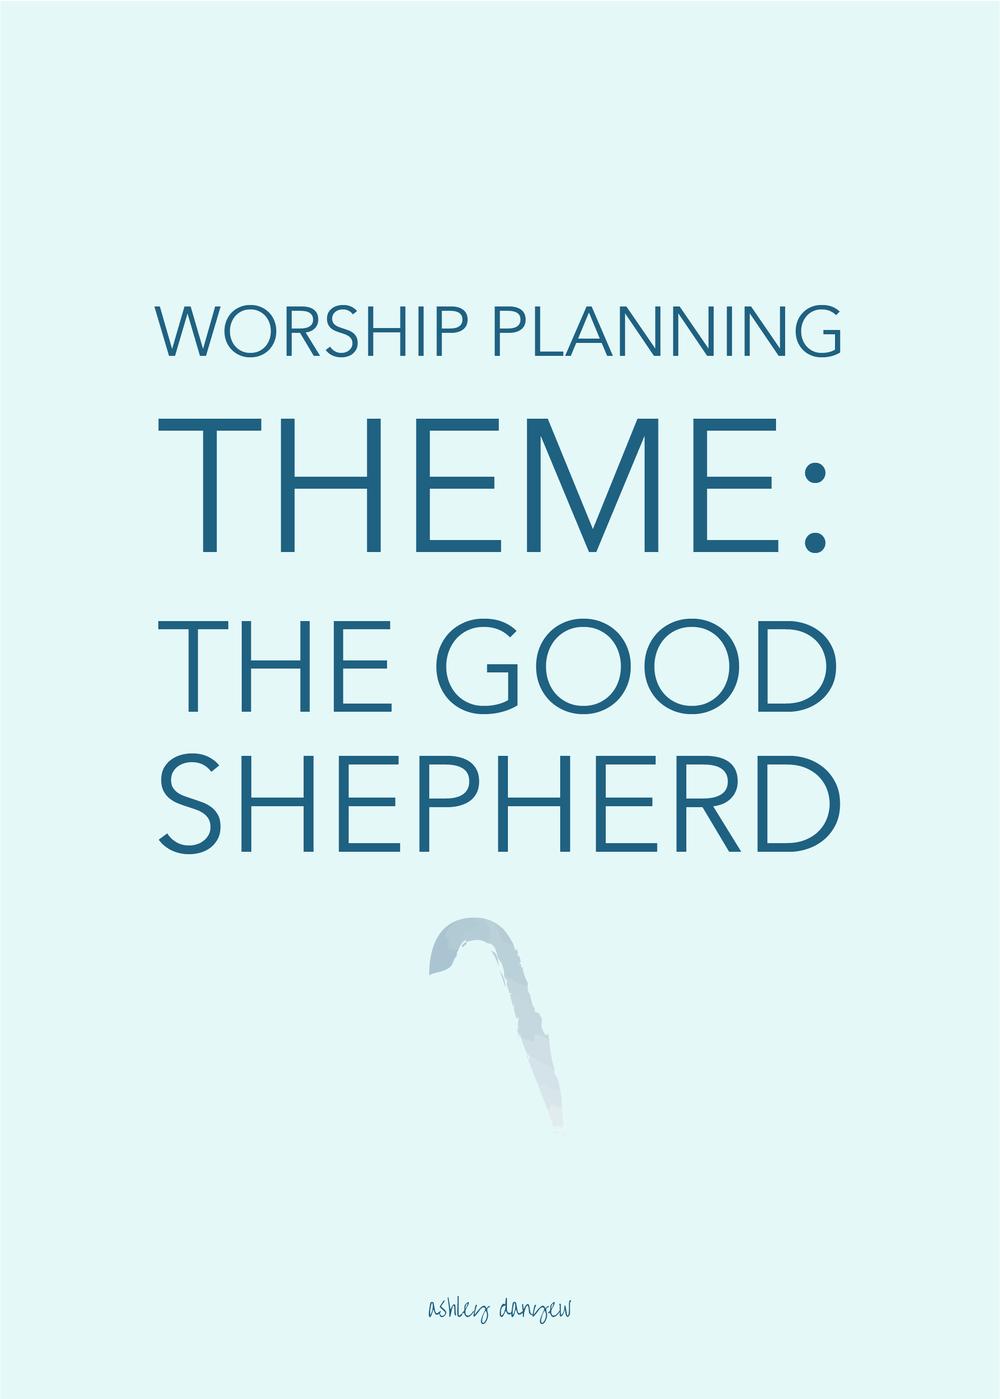 Copy of Worship Planning Theme: The Good Shepherd